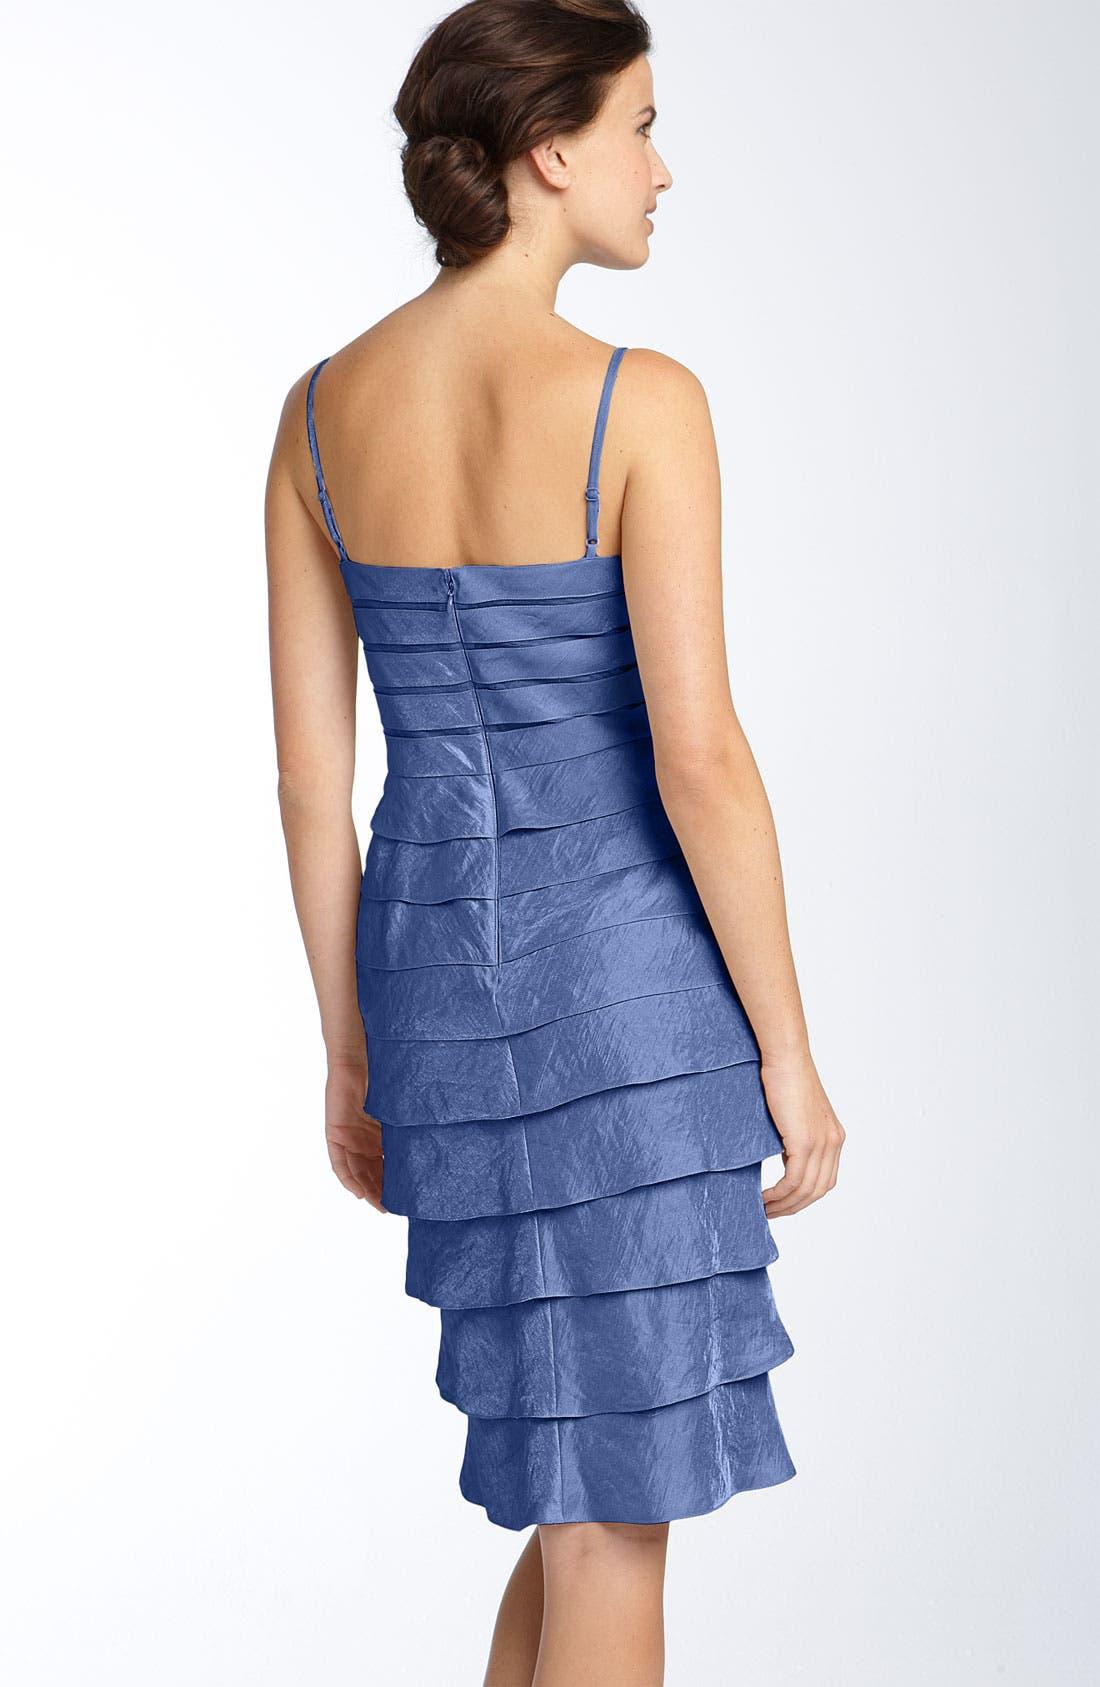 Alternate Image 3  - Adrianna Papell Tiered Hammered Satin Sheath Dress & Bolero (Regular & Petite)